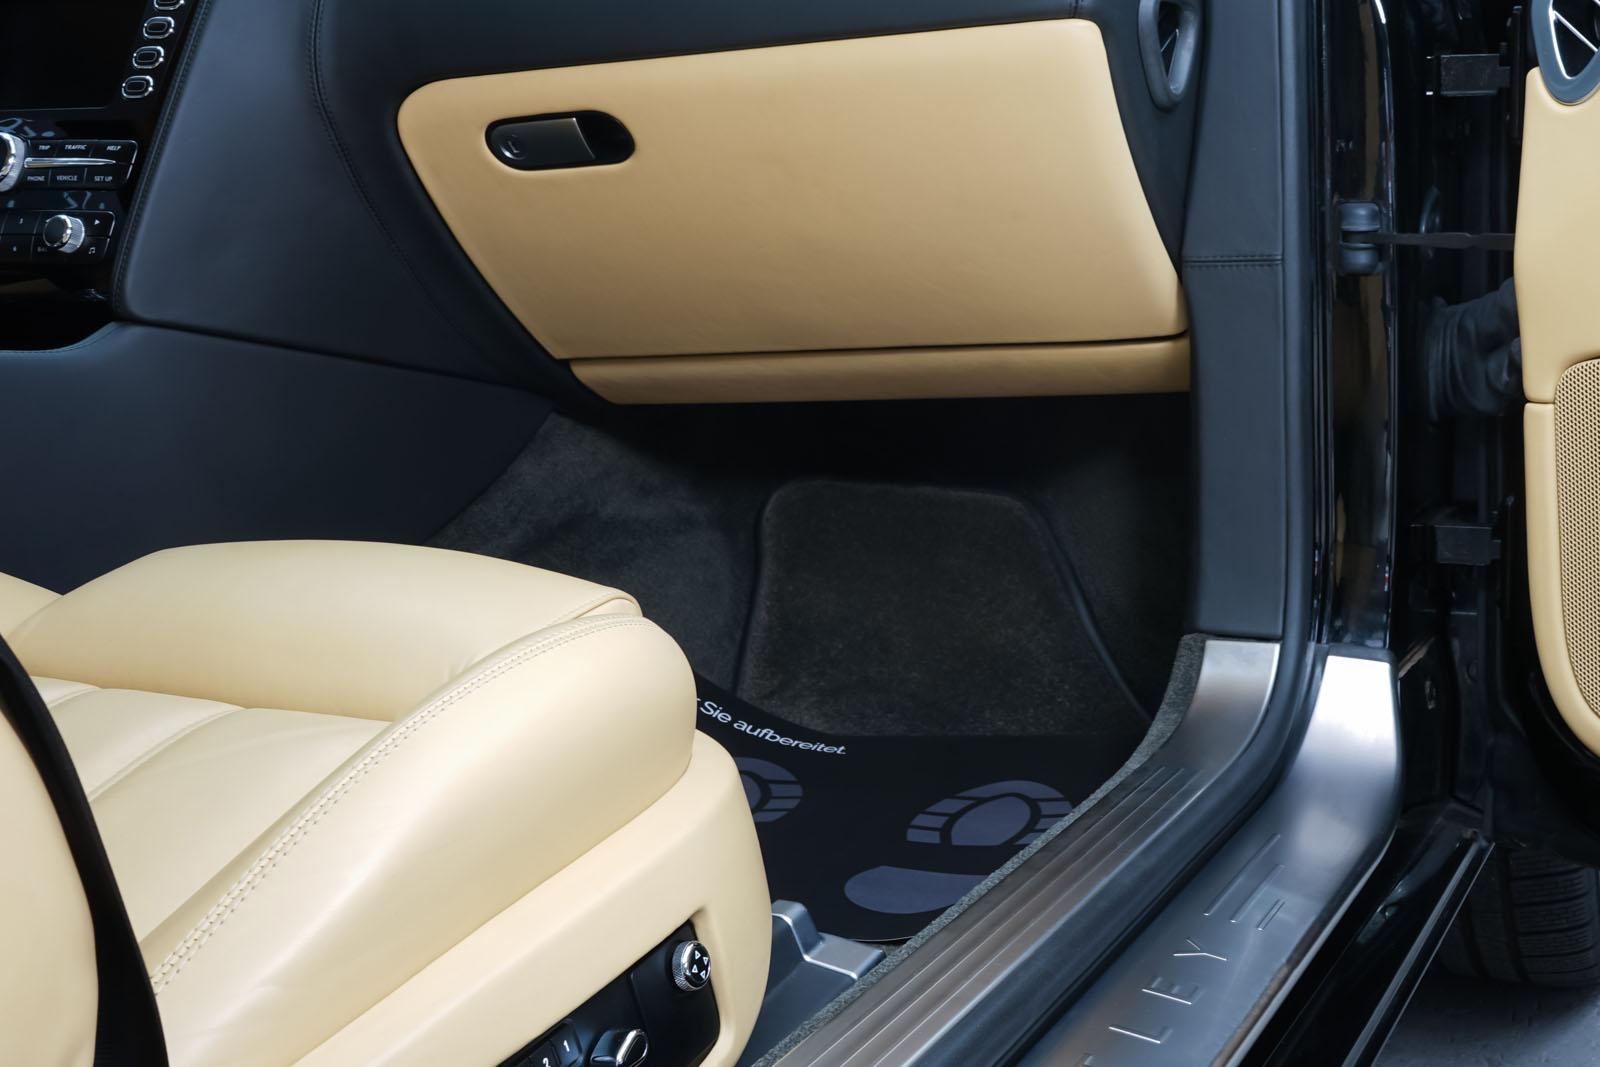 Bentley_Continental_GT_Schwarz_Beige_BEN-1159_17_w